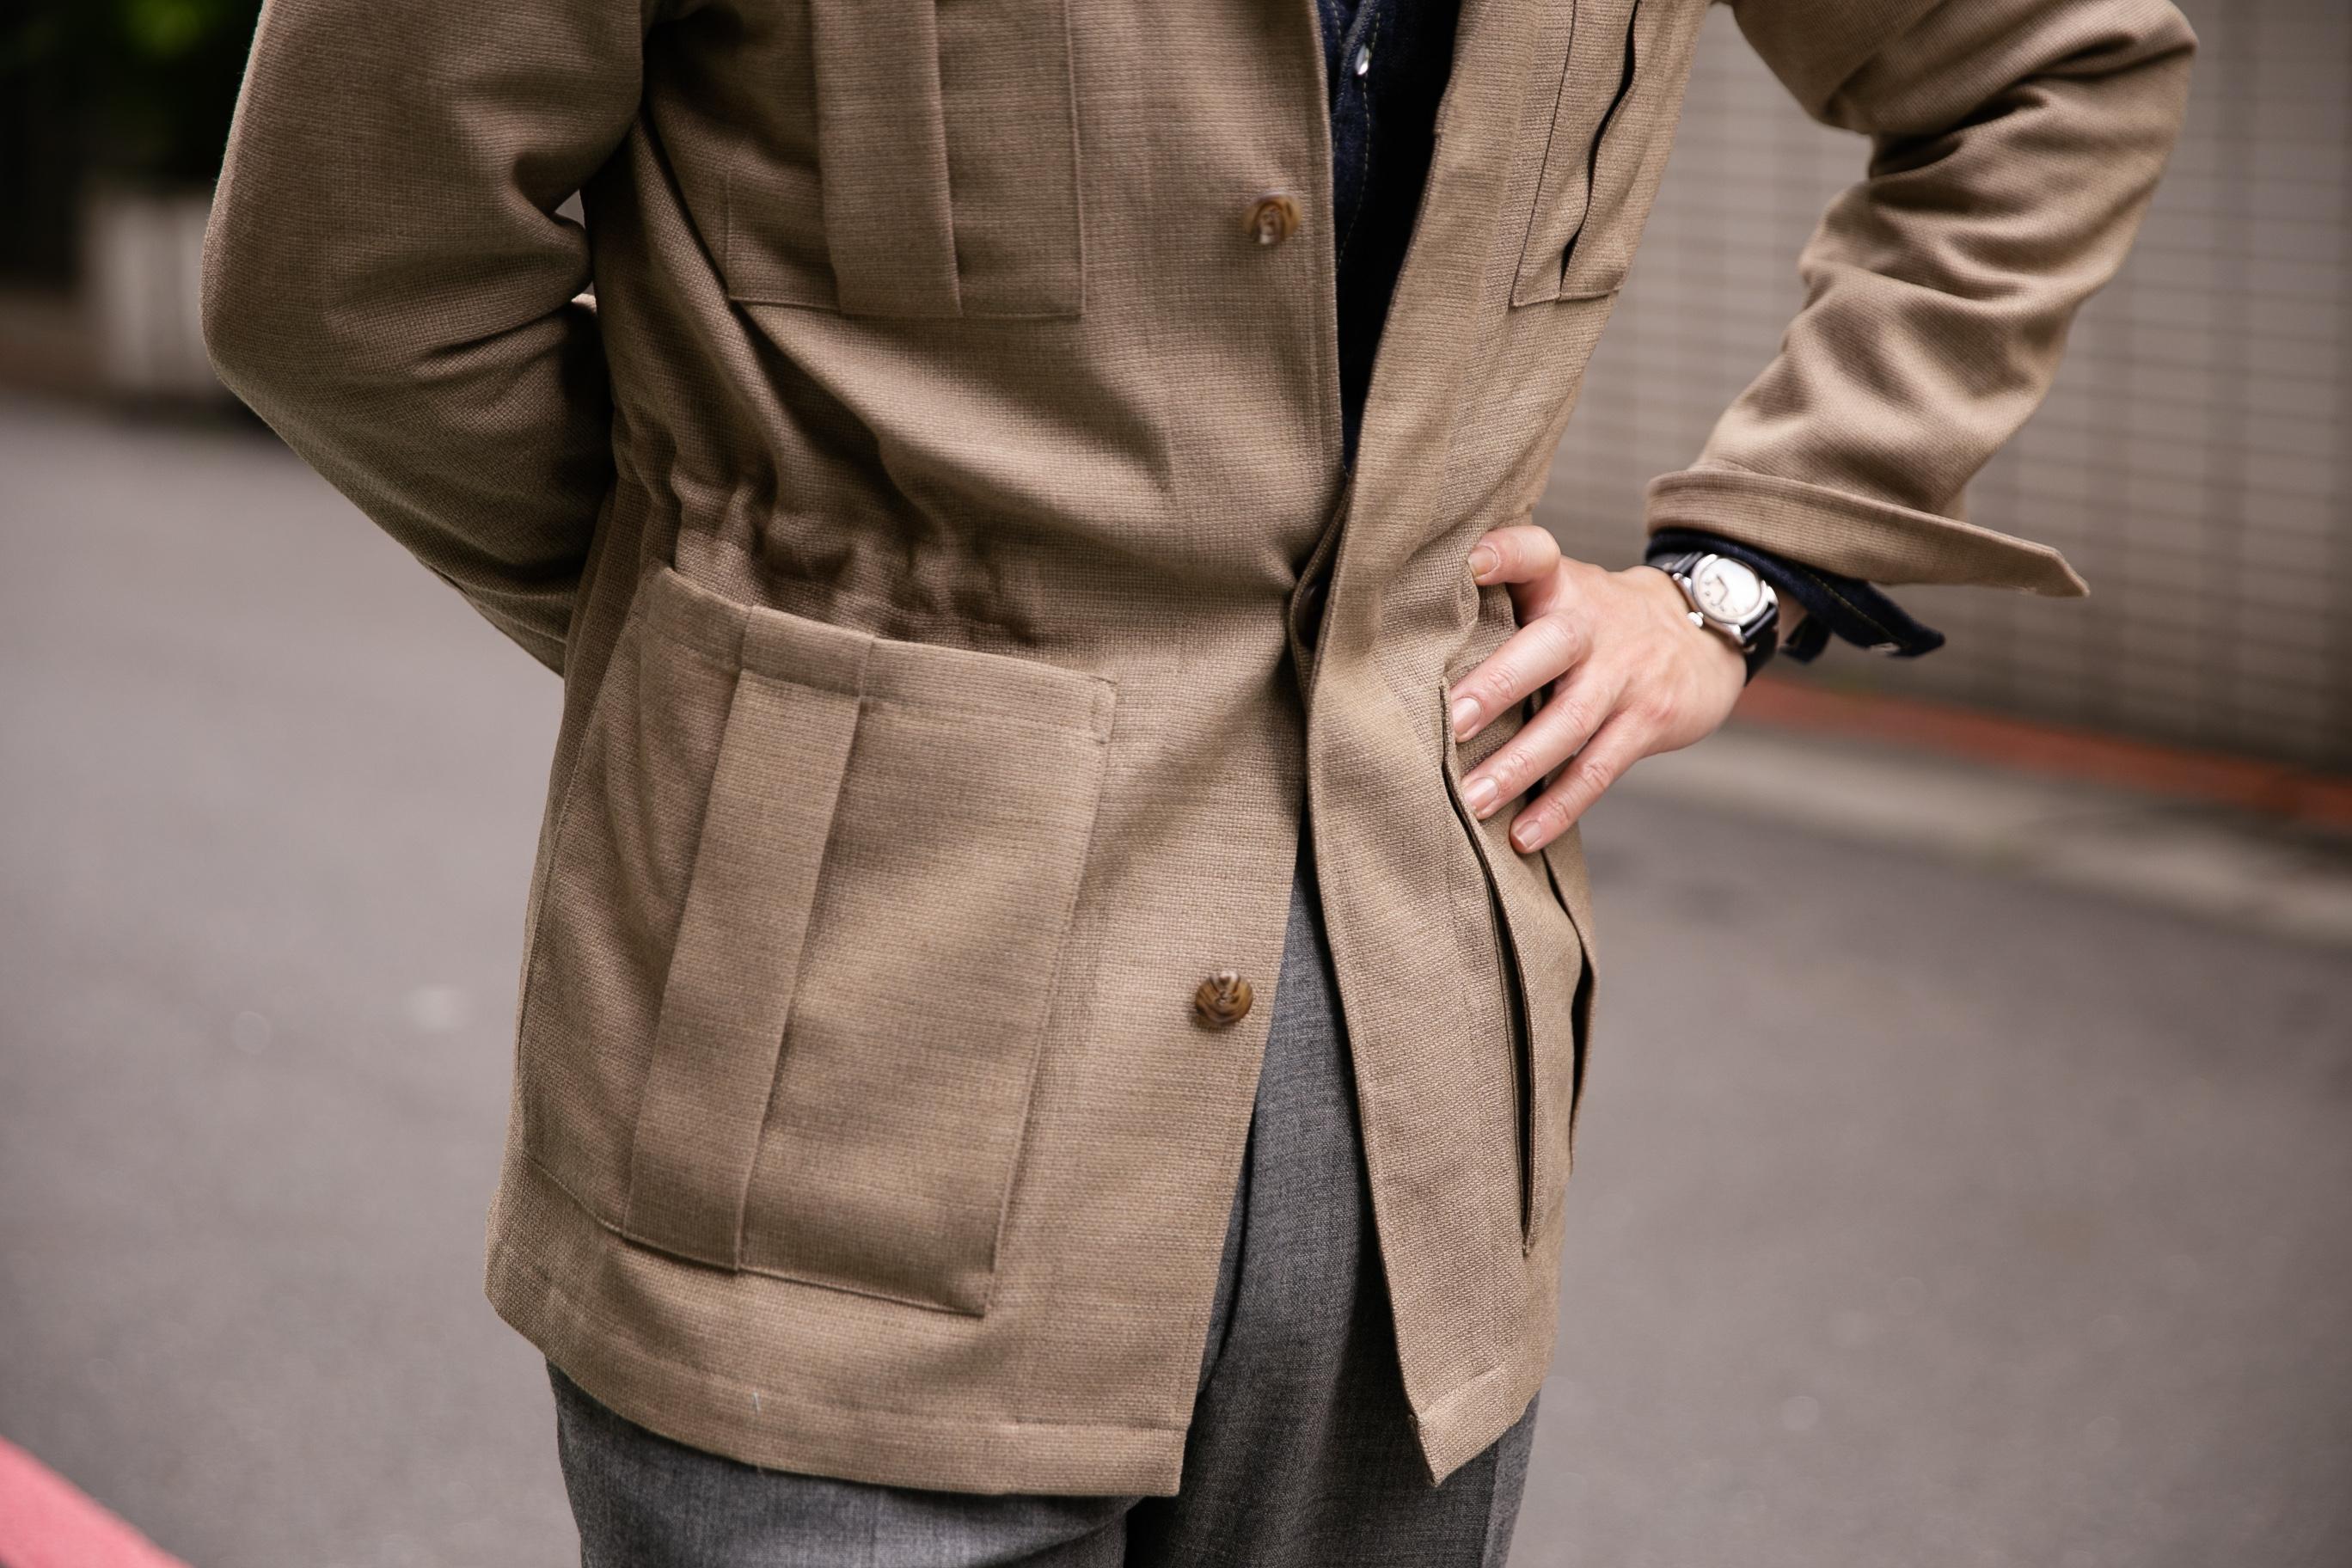 Мужской стиль: куртка сафари для разных типажей Кибби